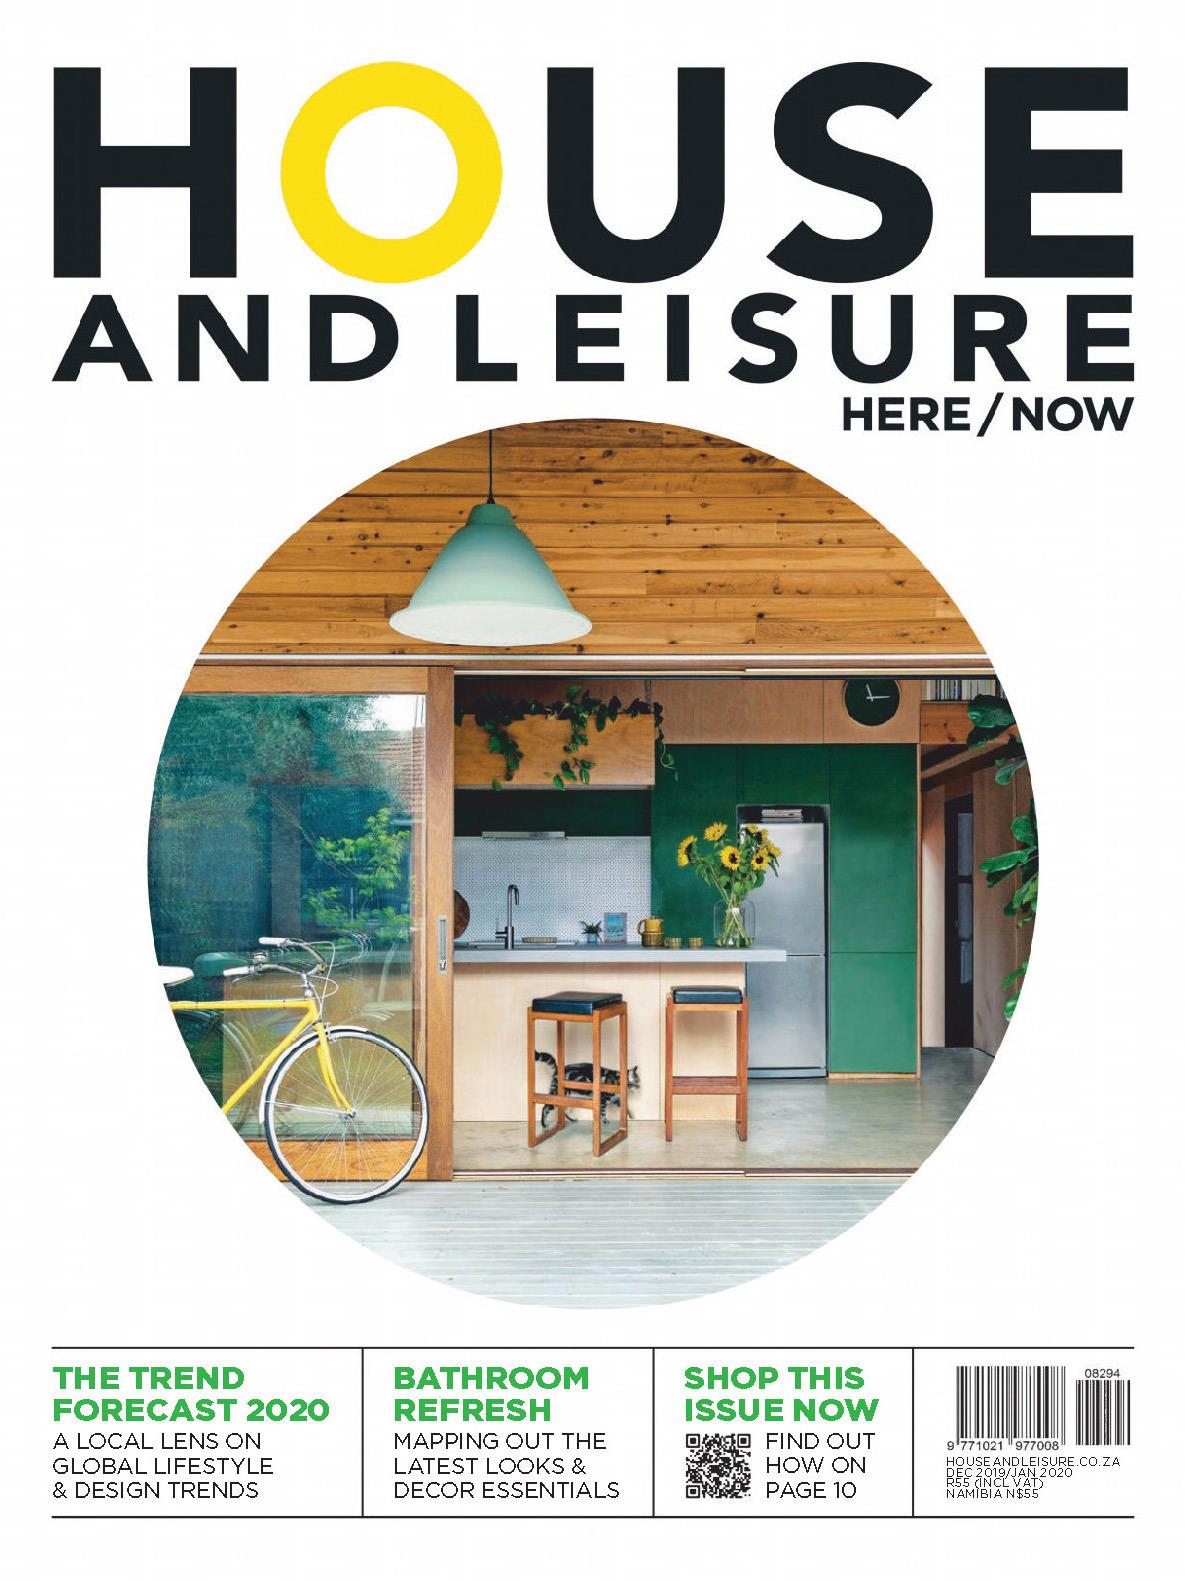 《House and Leisure》南非版时尚家居设计杂志2019年12月-2020年01月号